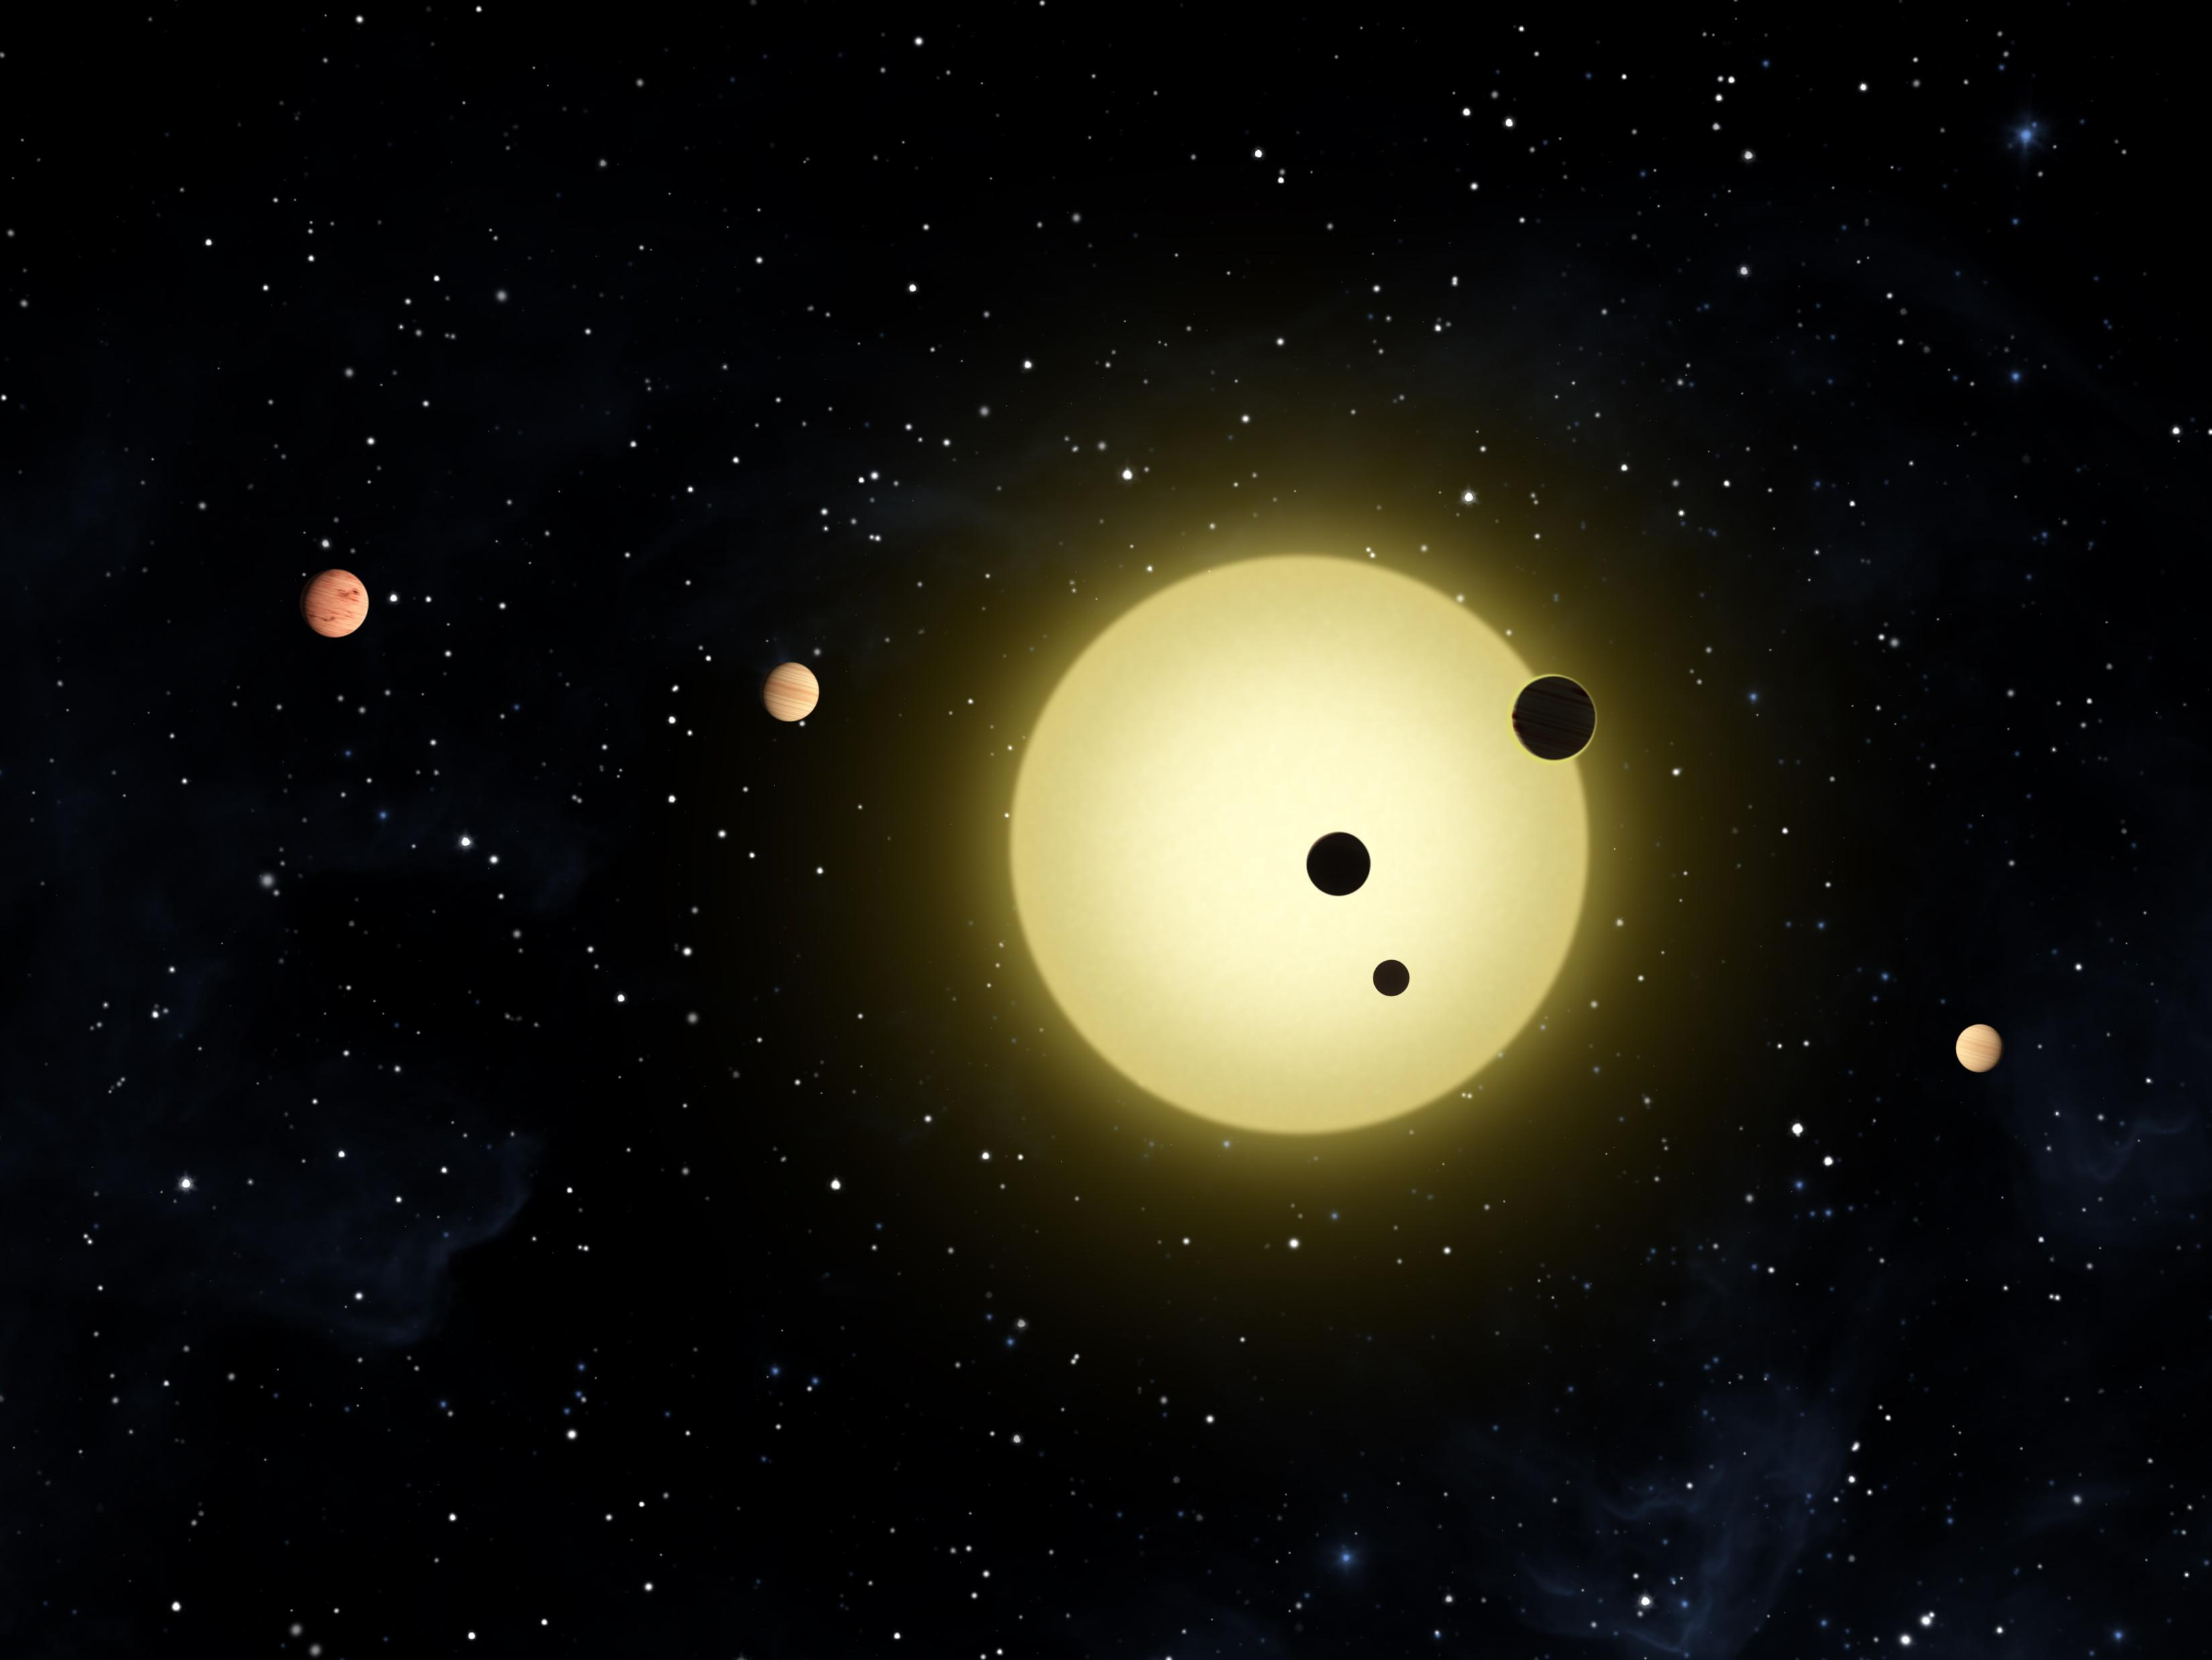 NASA's Kepler Spacecraft Discovers Extraordinary New ...